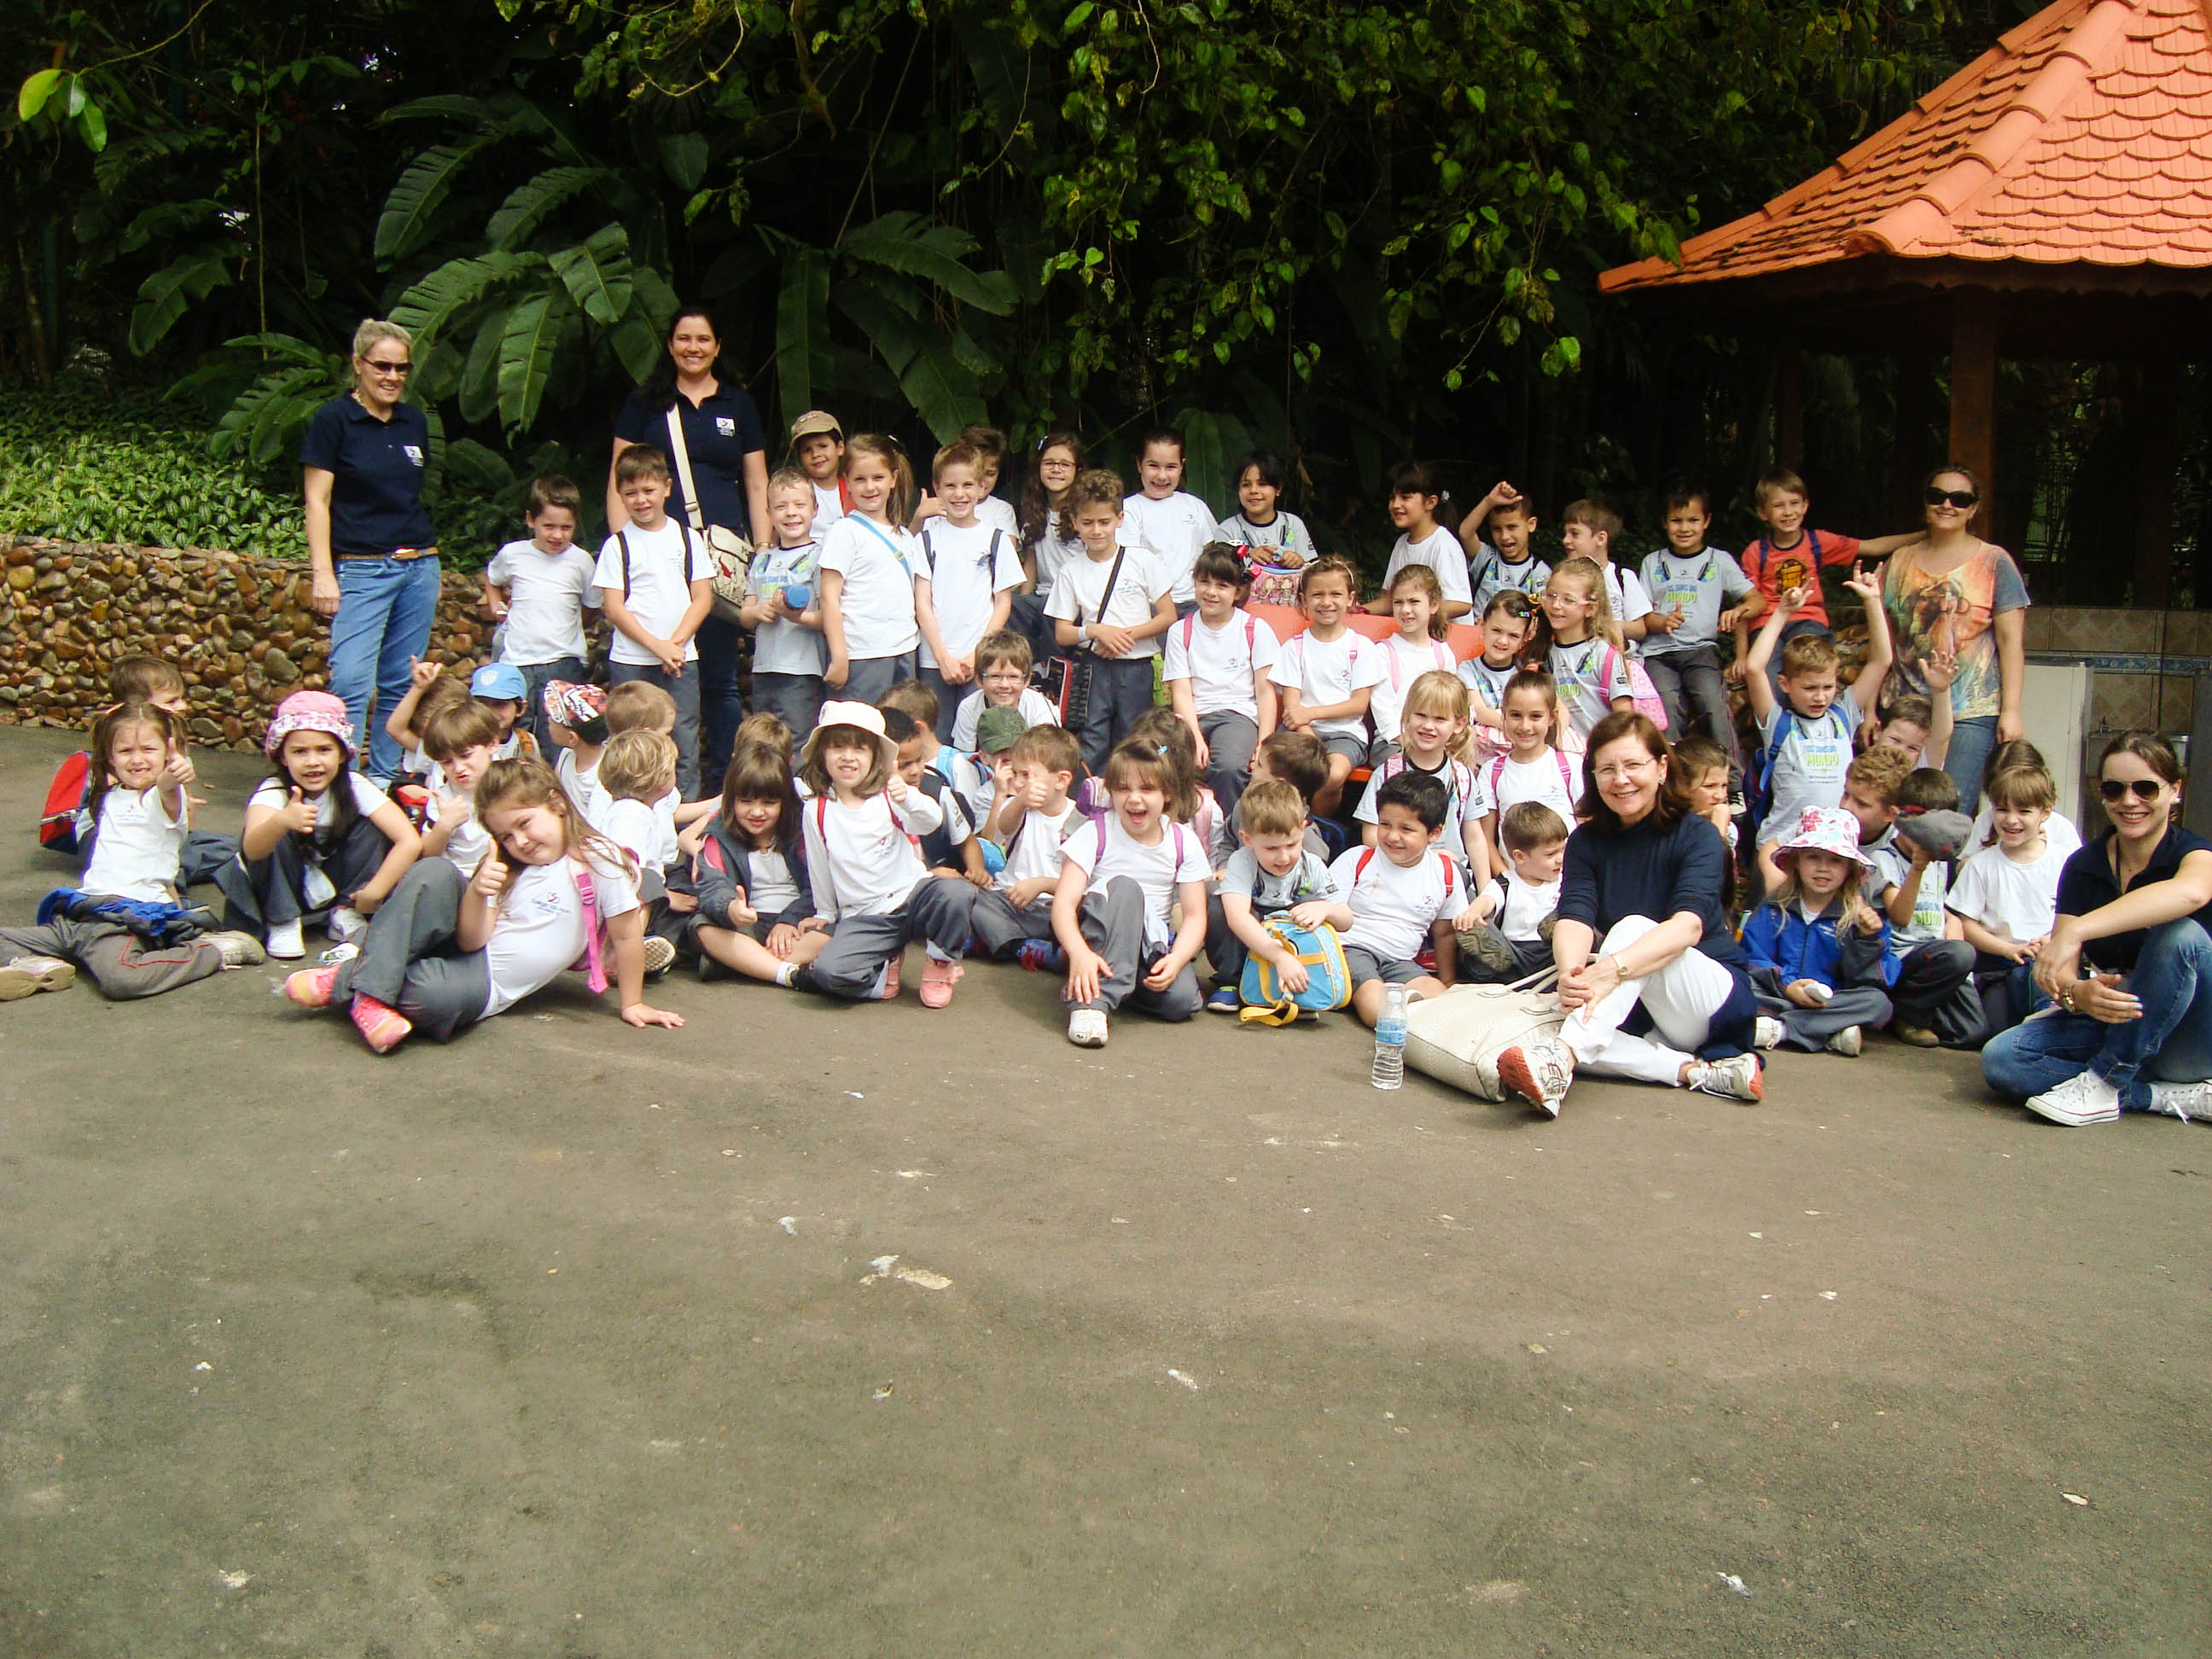 Asccsp30102013_-_visita_zoologico__7_